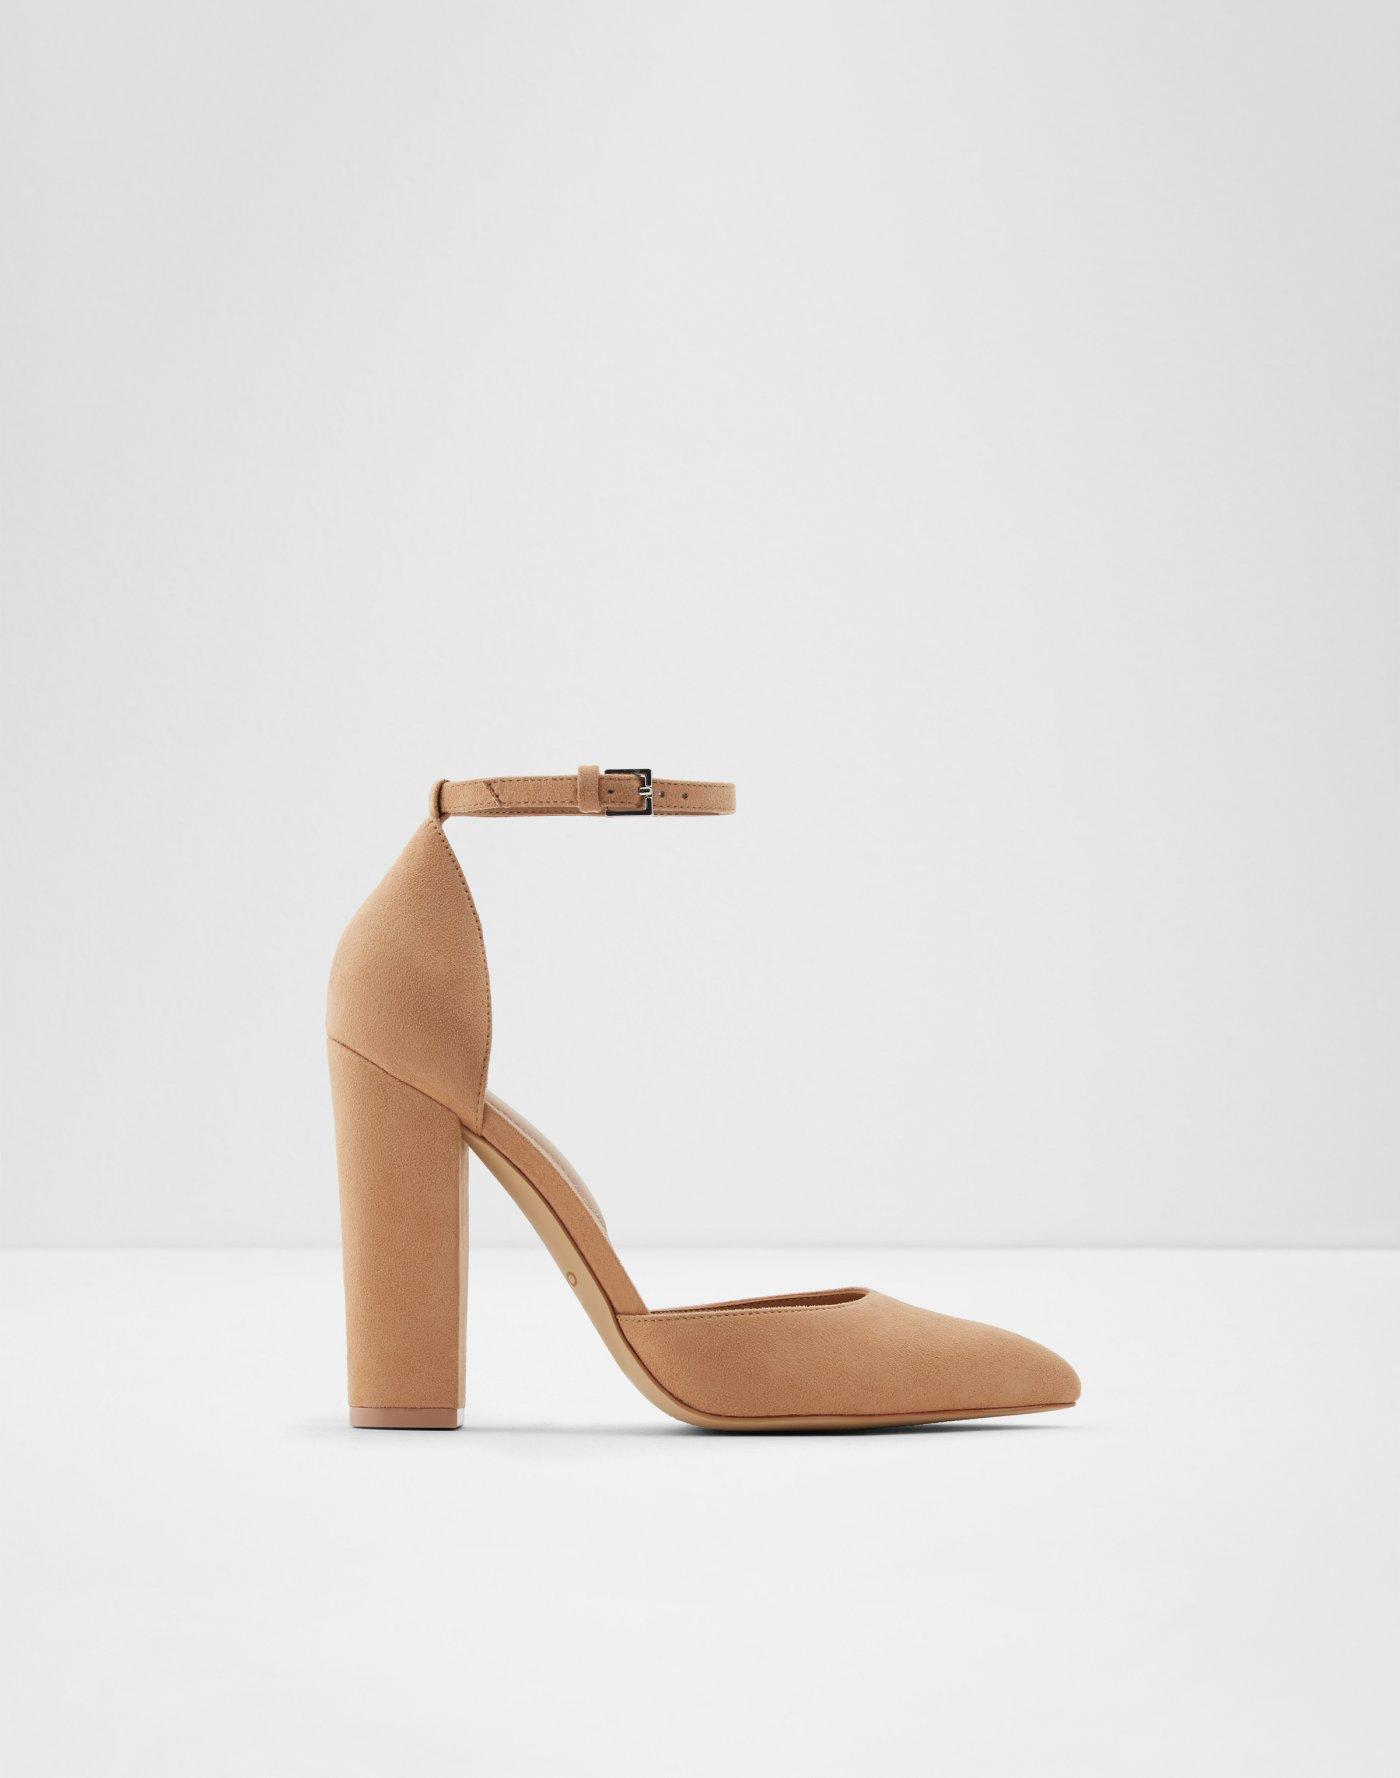 f5b8018be6 Women's Heels | Black, Red, Nude, Silver Heels | ALDO US | Aldoshoes.com US